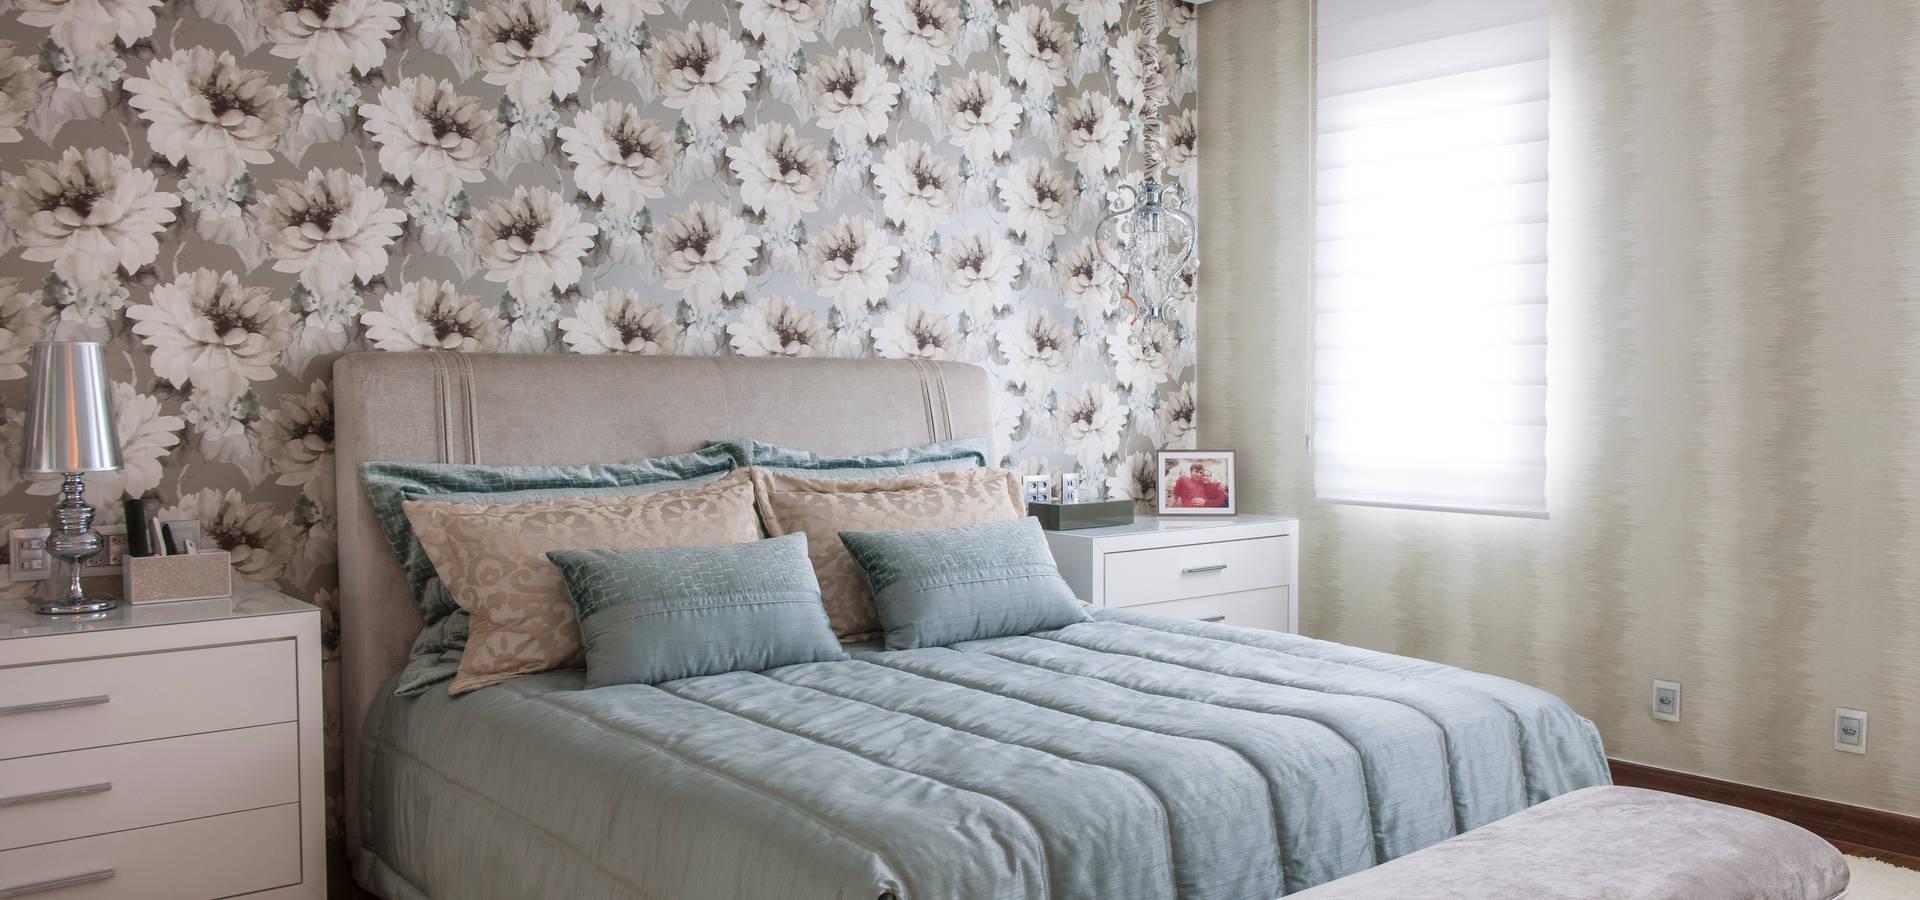 Adriana Di Garcia Design de Interiores Ltda